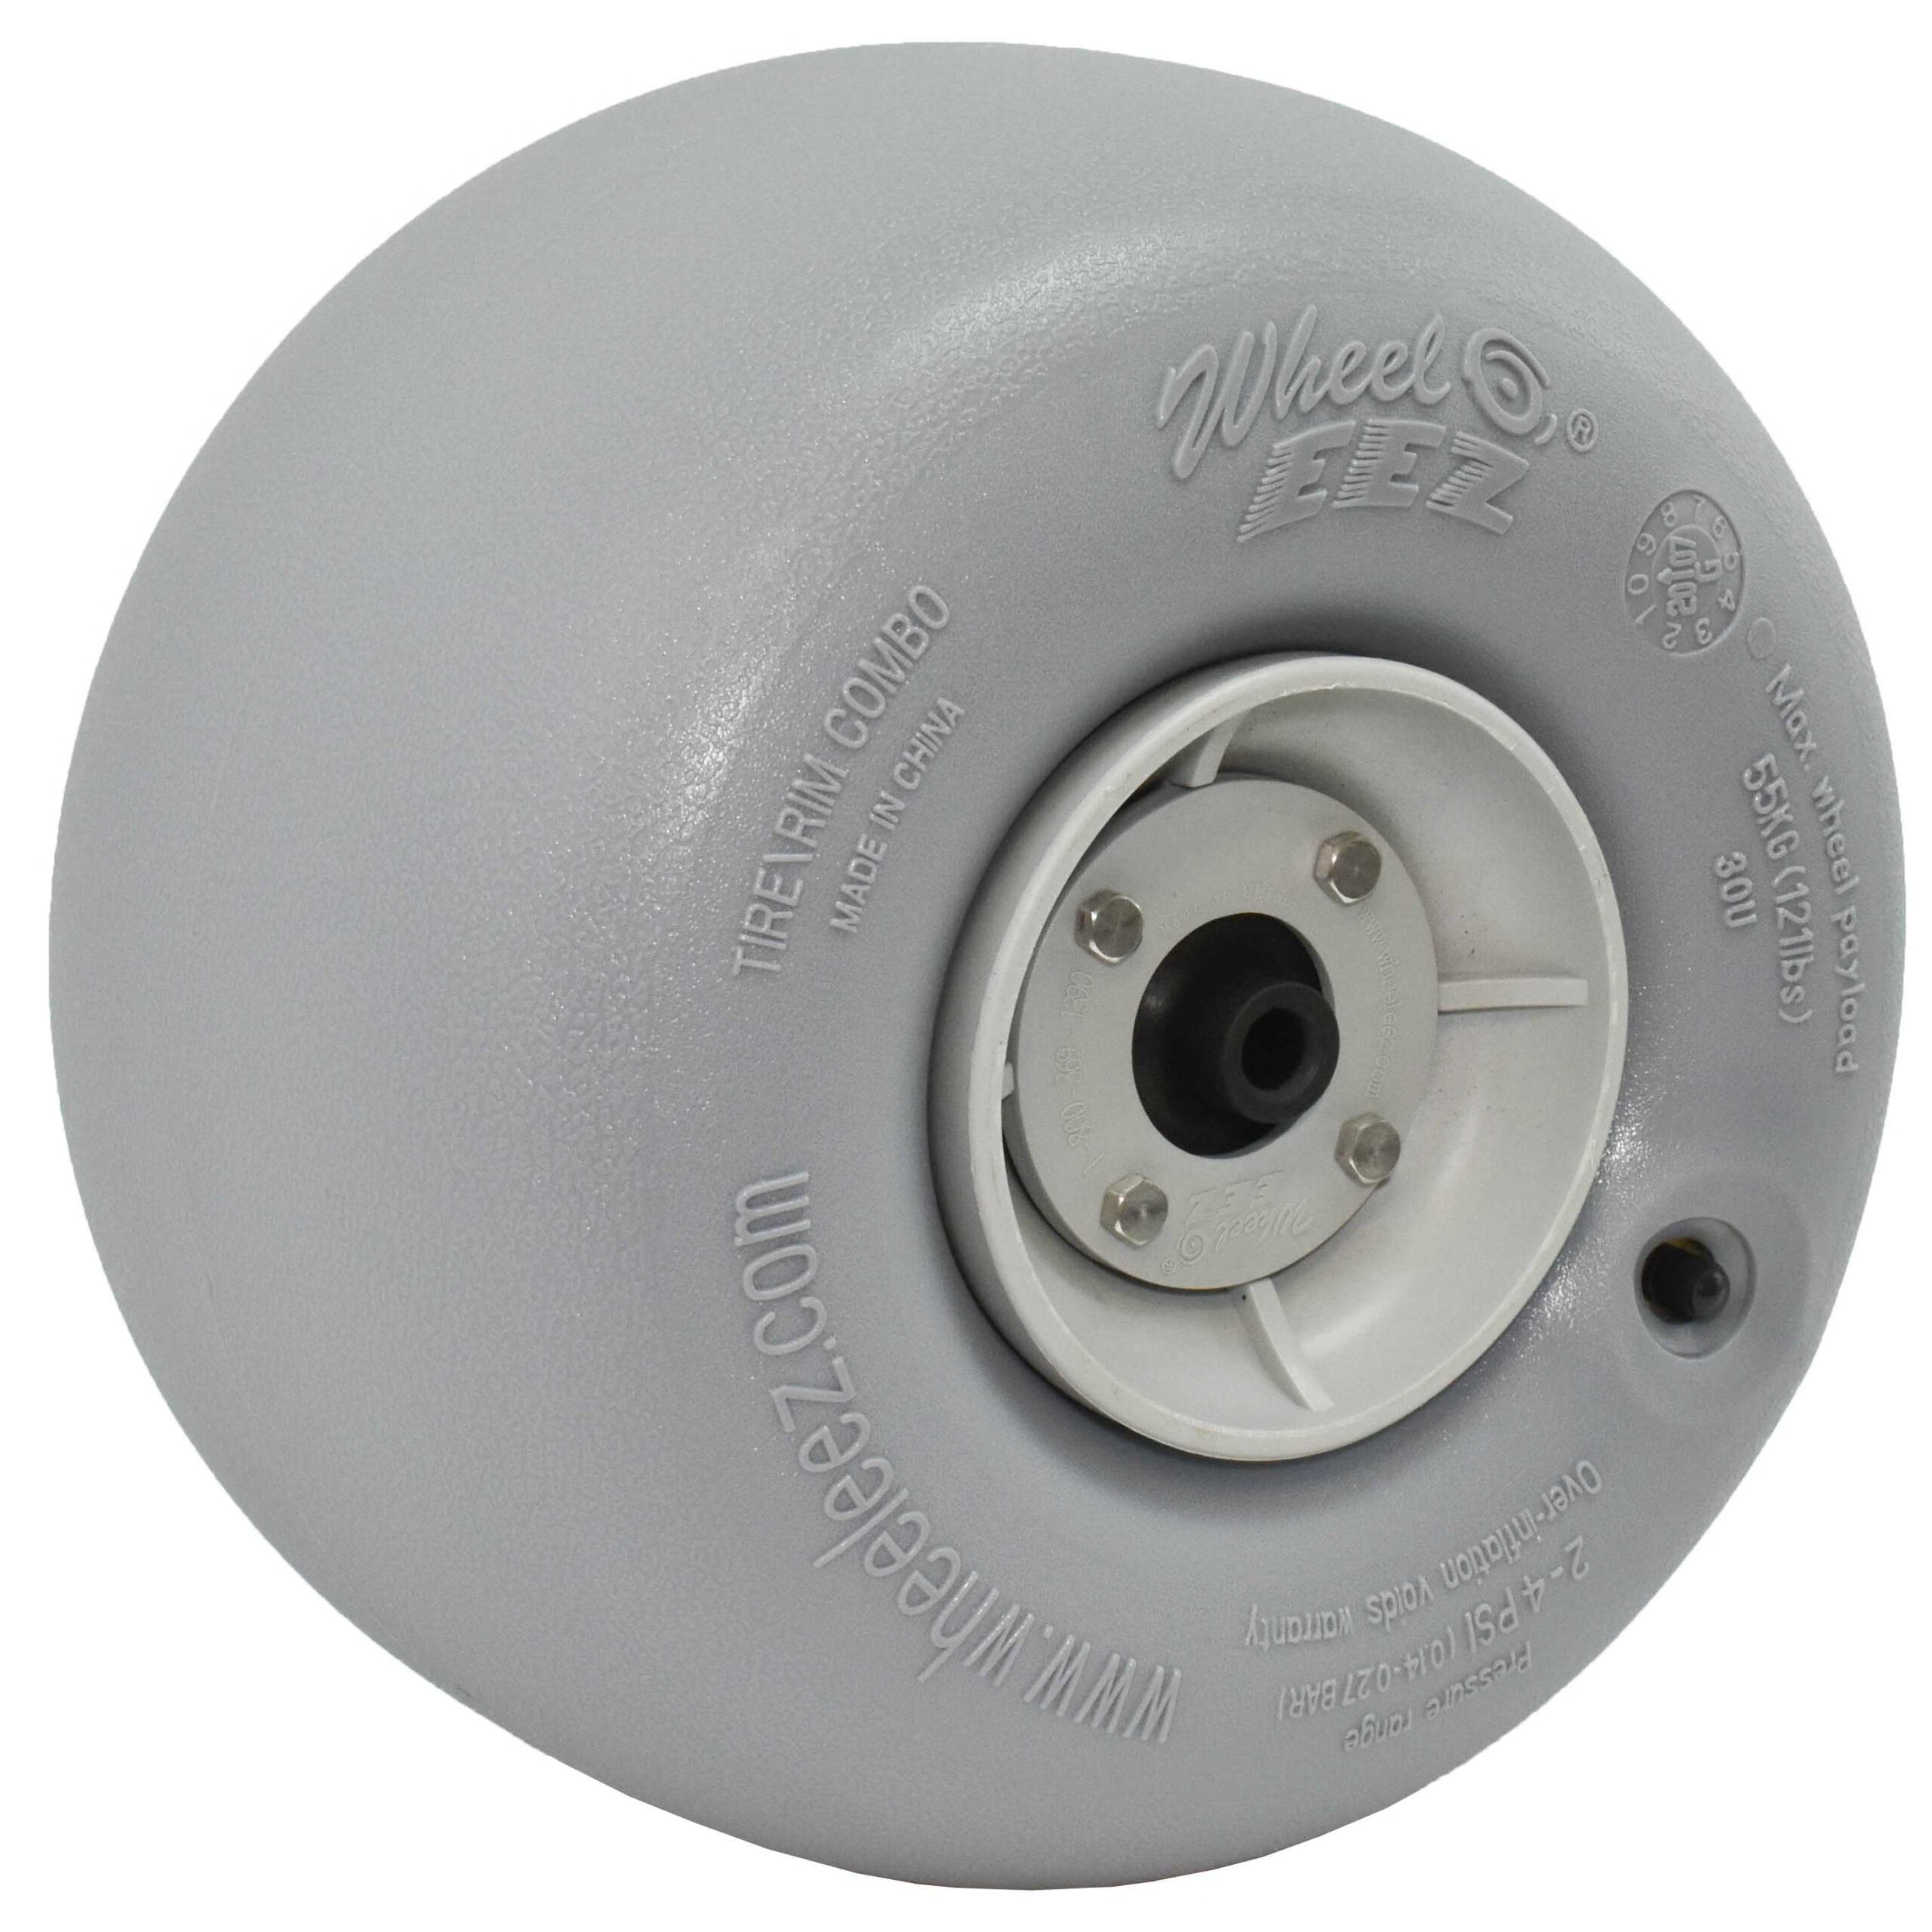 PU30ZZ Length: PU 6X30X30 Ochoos 5PCS Stainless Steel Ball Bearing Double Wheel PU Rubber Soft Sliding Wheel Diameter 30MM Flat Type PU -